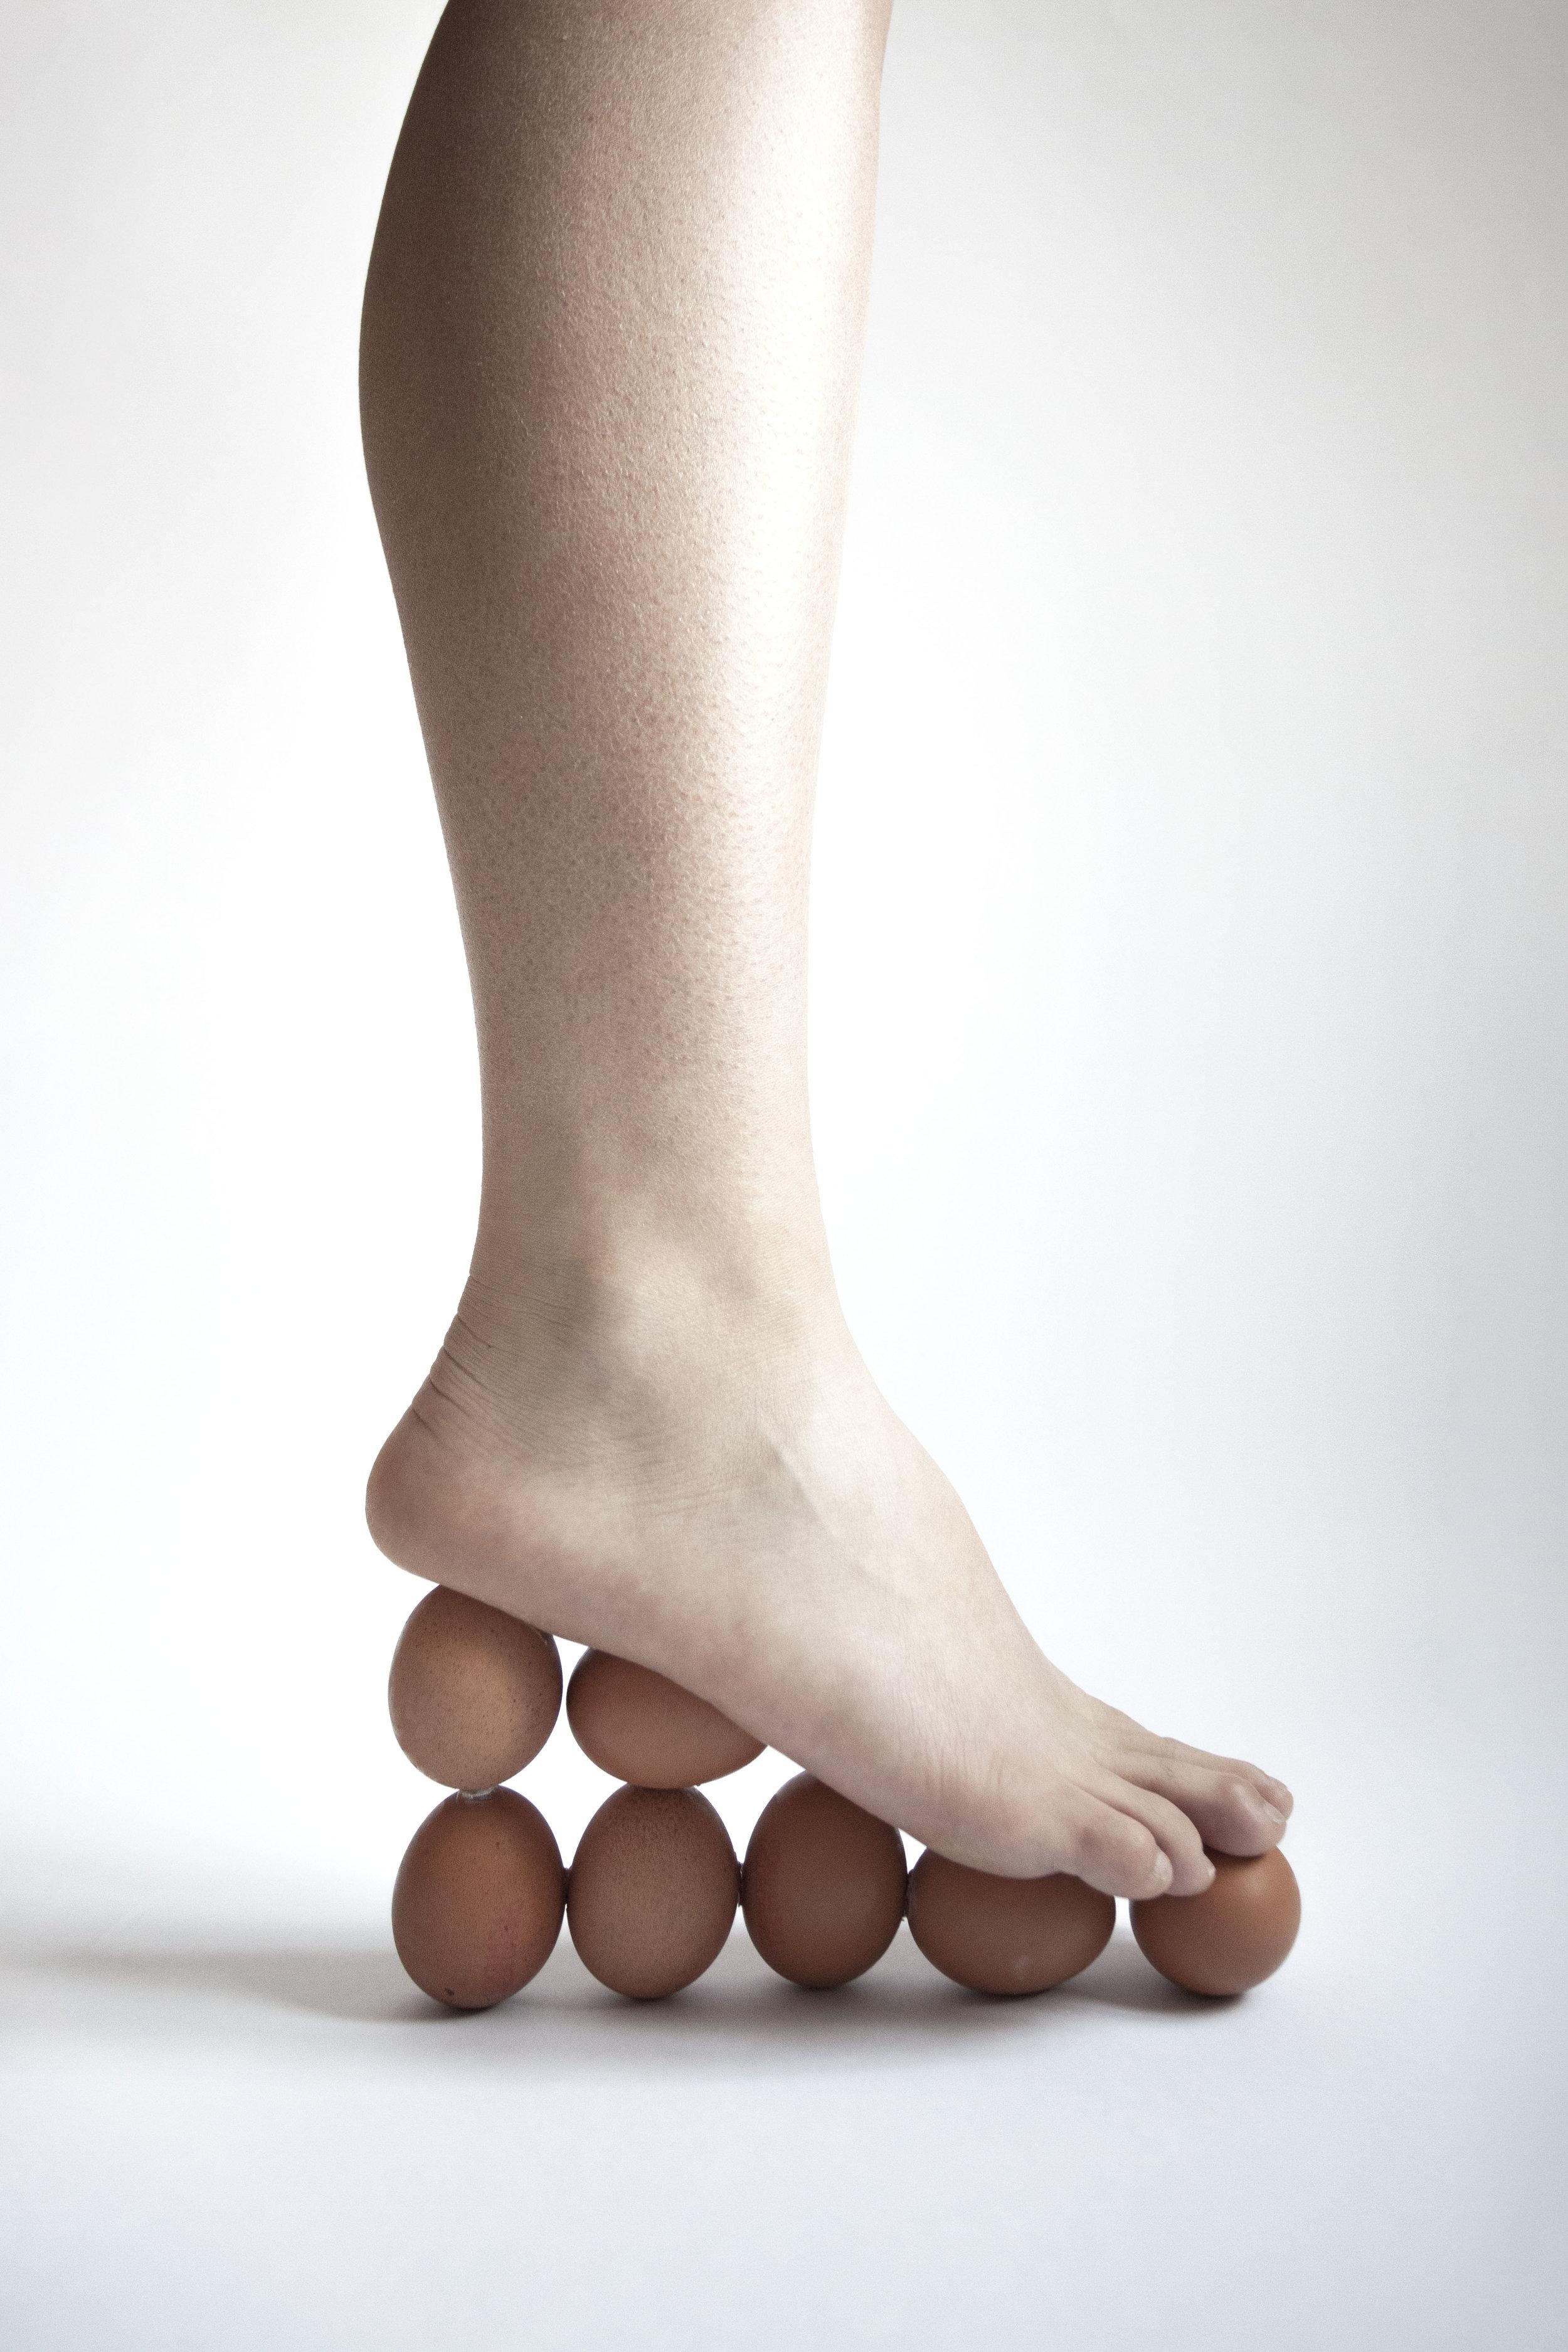 12 shoes - Julie1.jpg